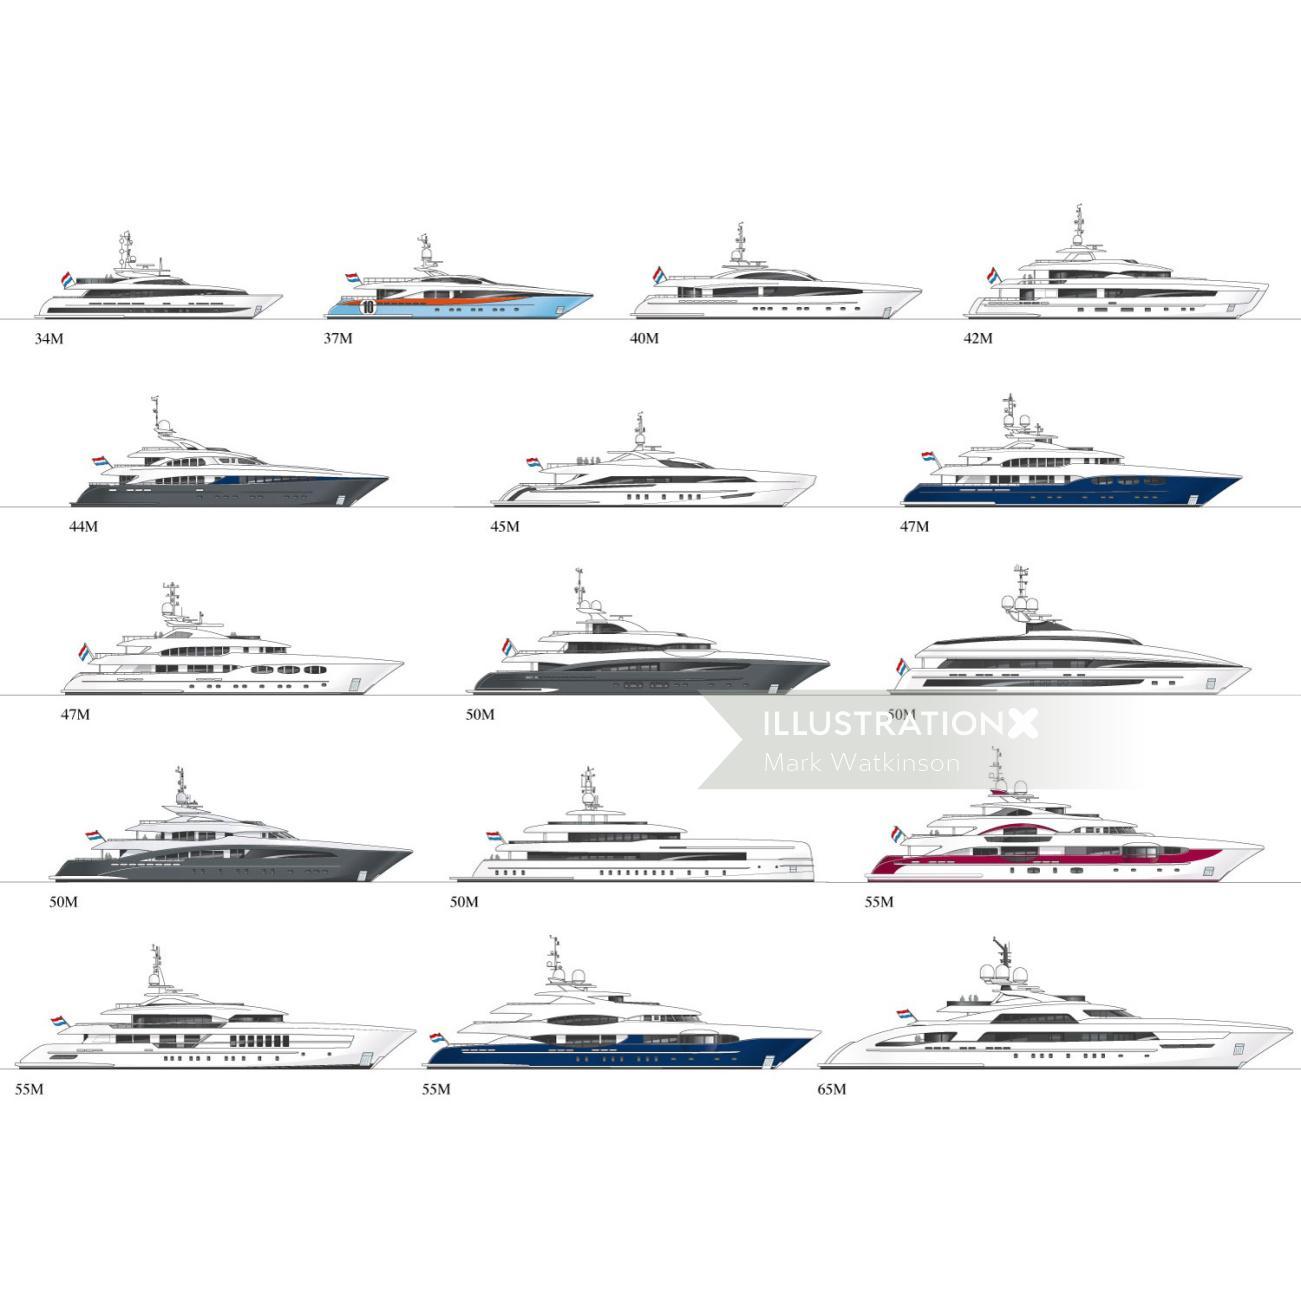 Illustration of ships